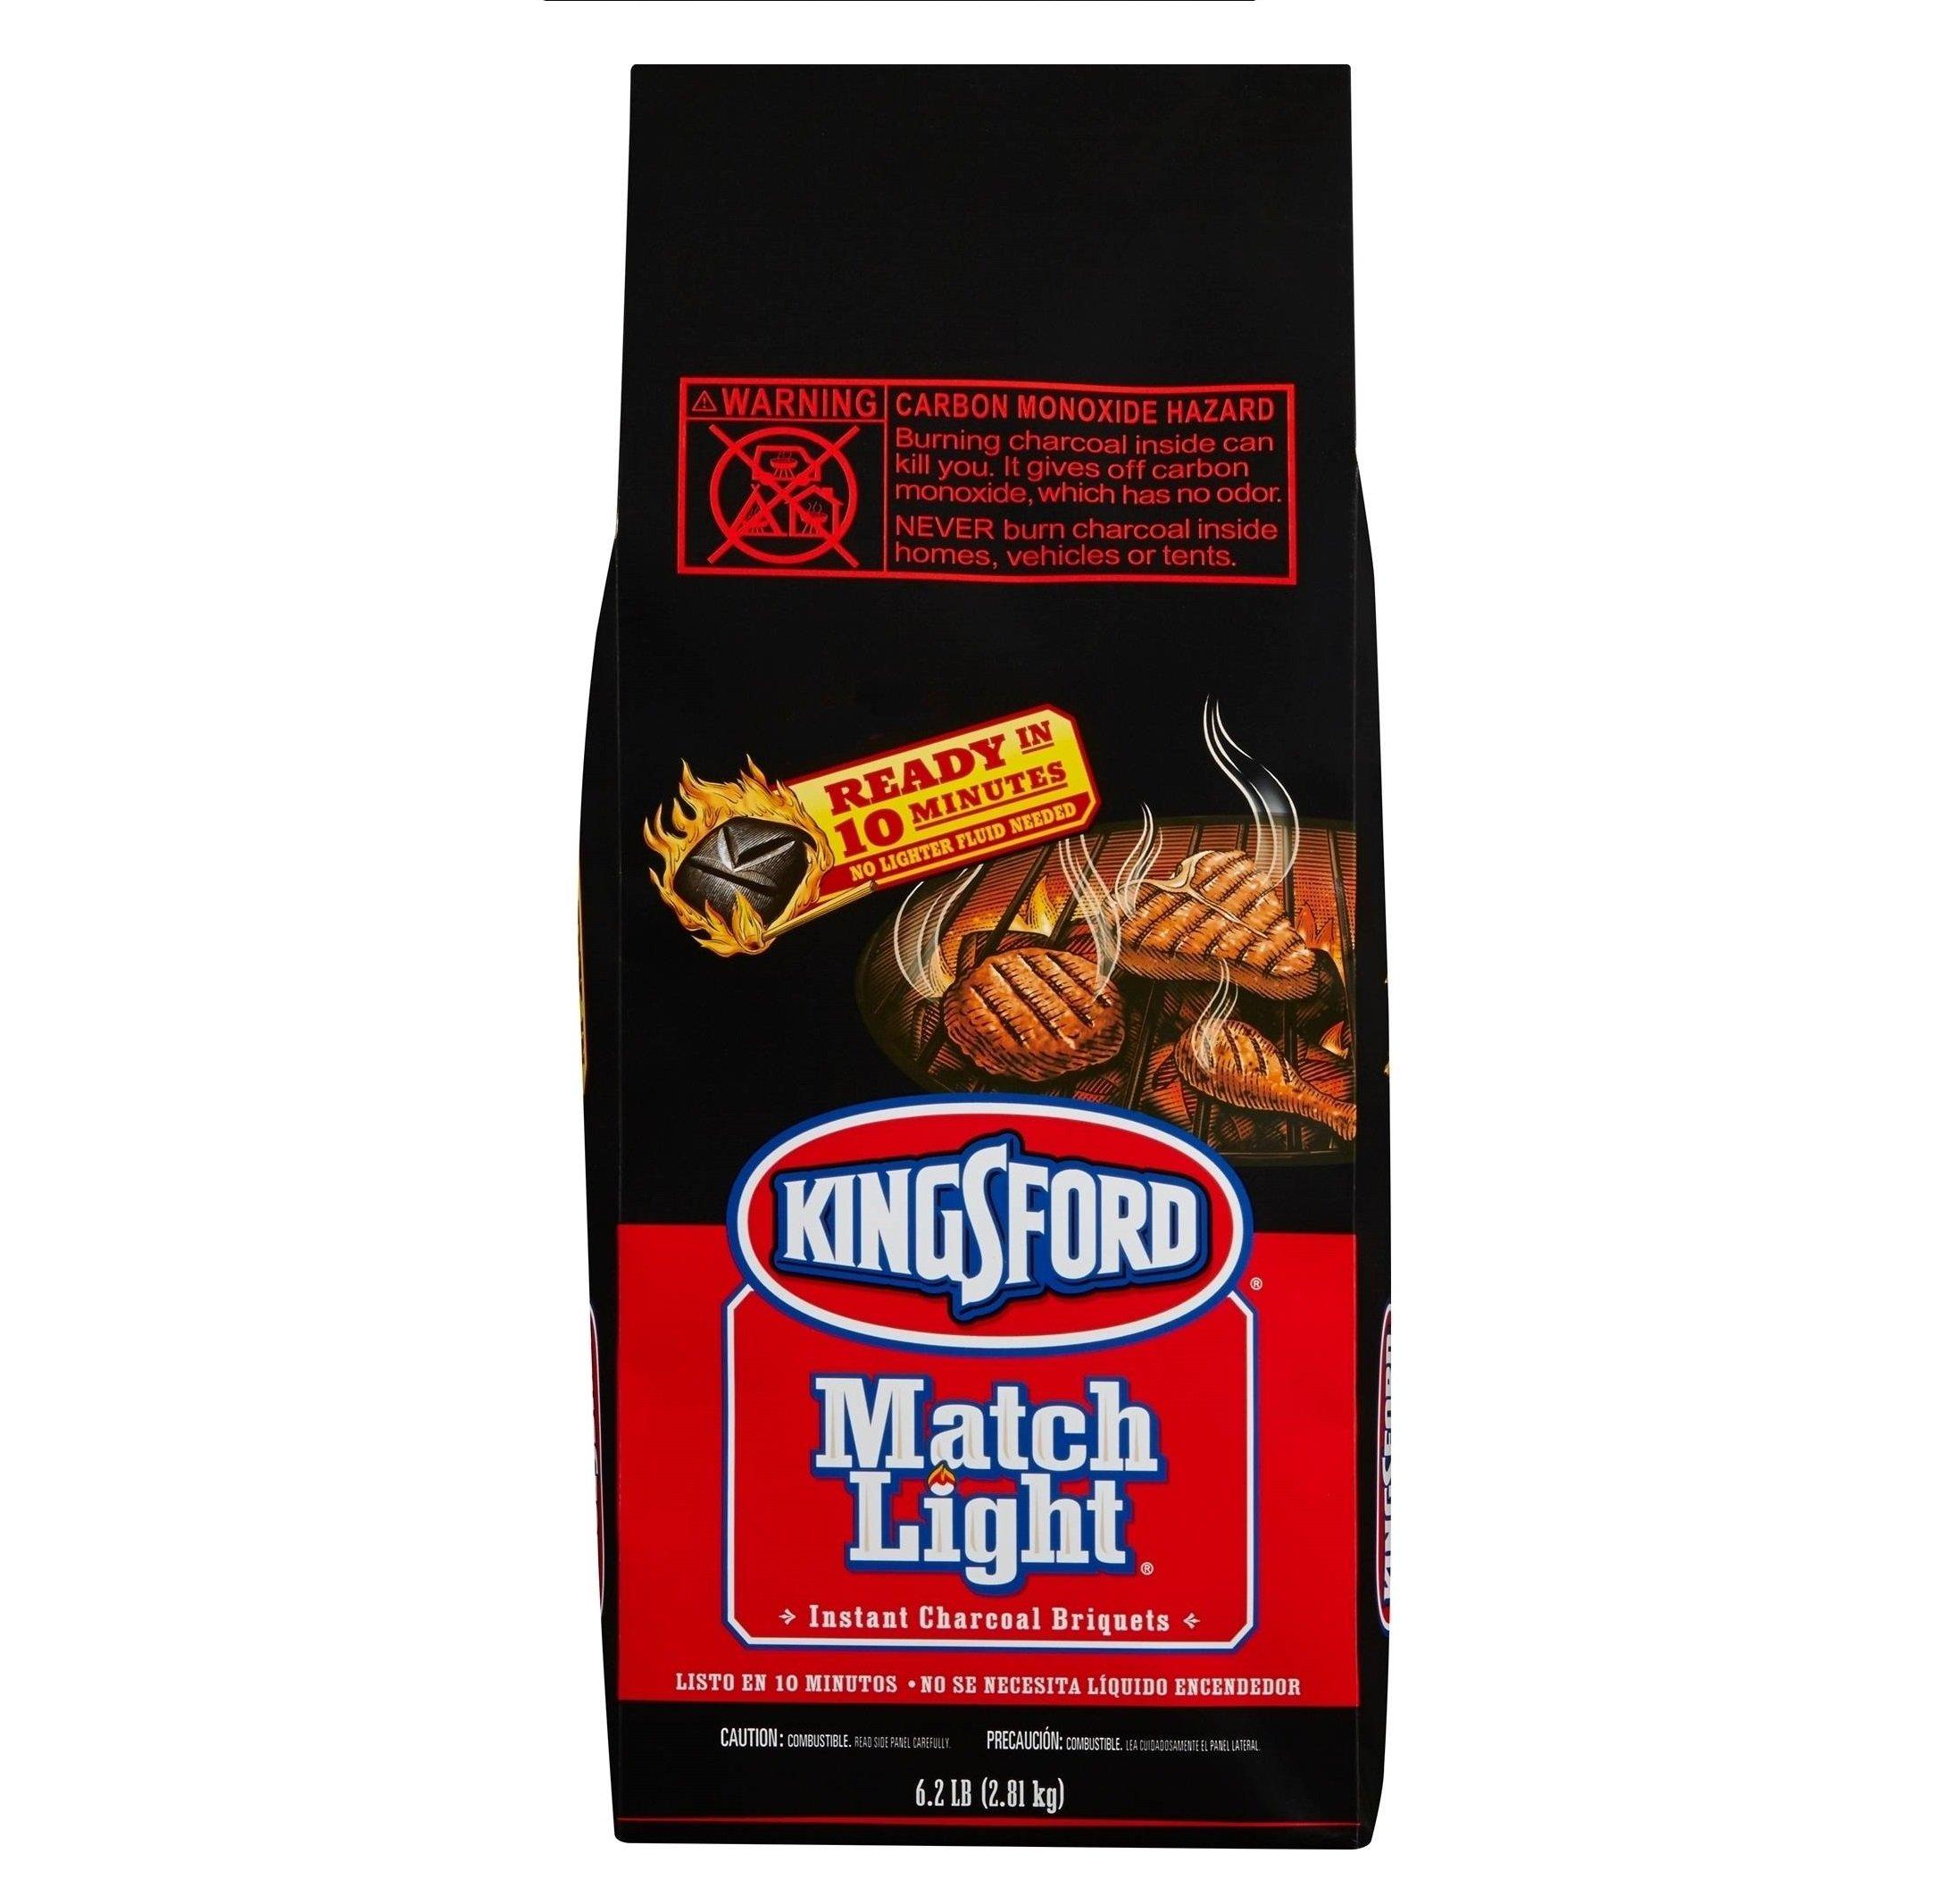 Kingsford Match Light Charcoal Briquets, Two 6.2 lb Bags